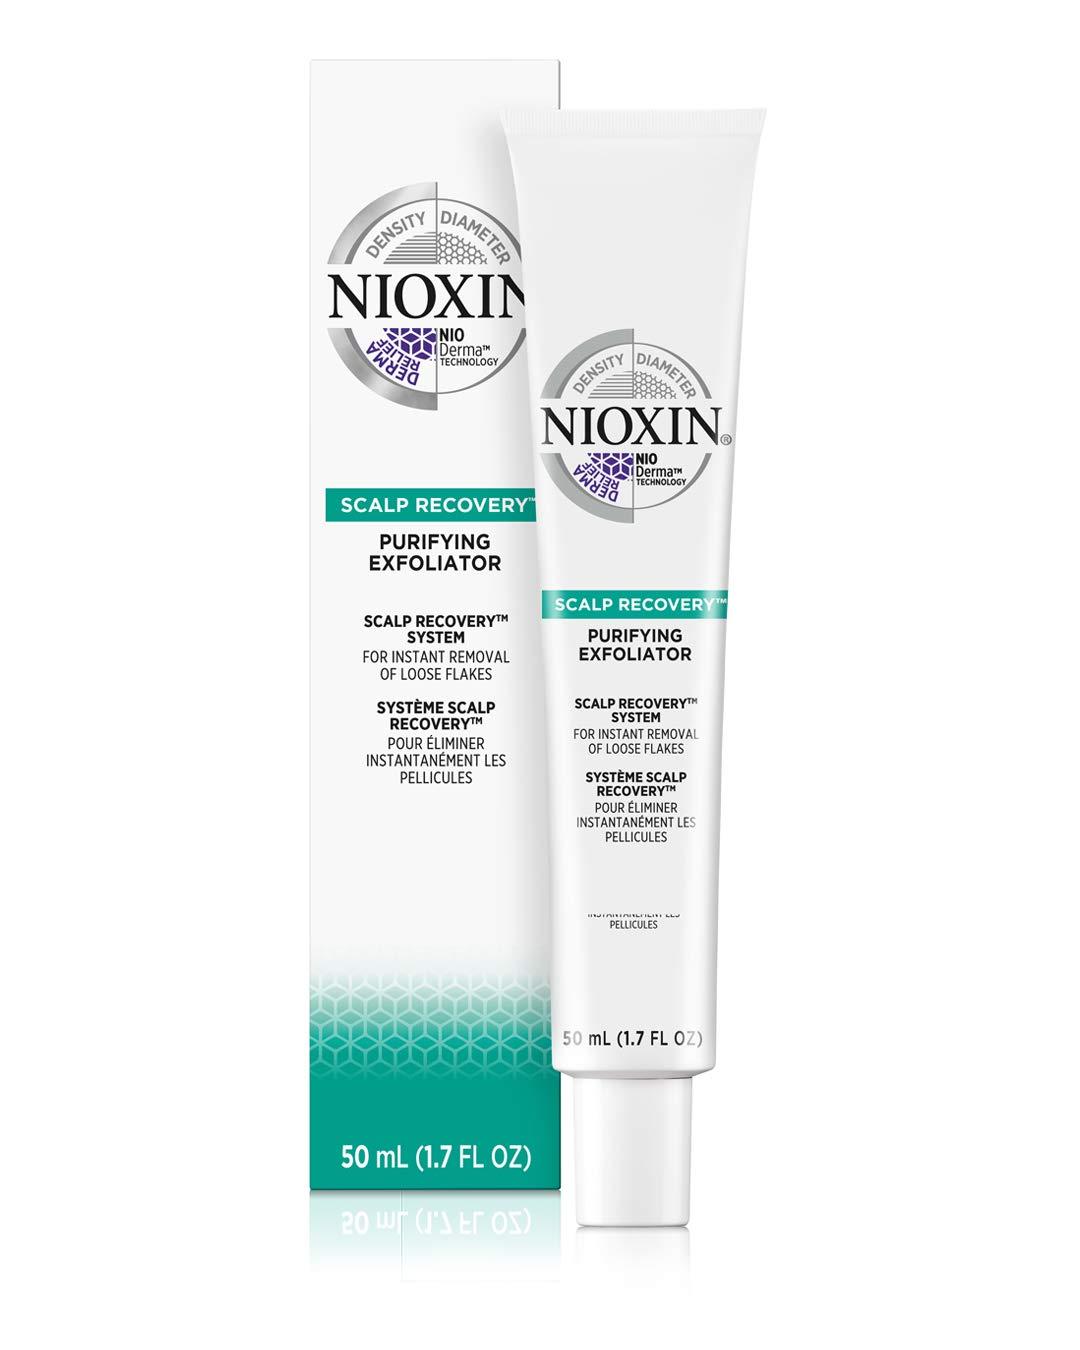 Nioxin Purifying Exfoliator Scalp Recovery Treatment